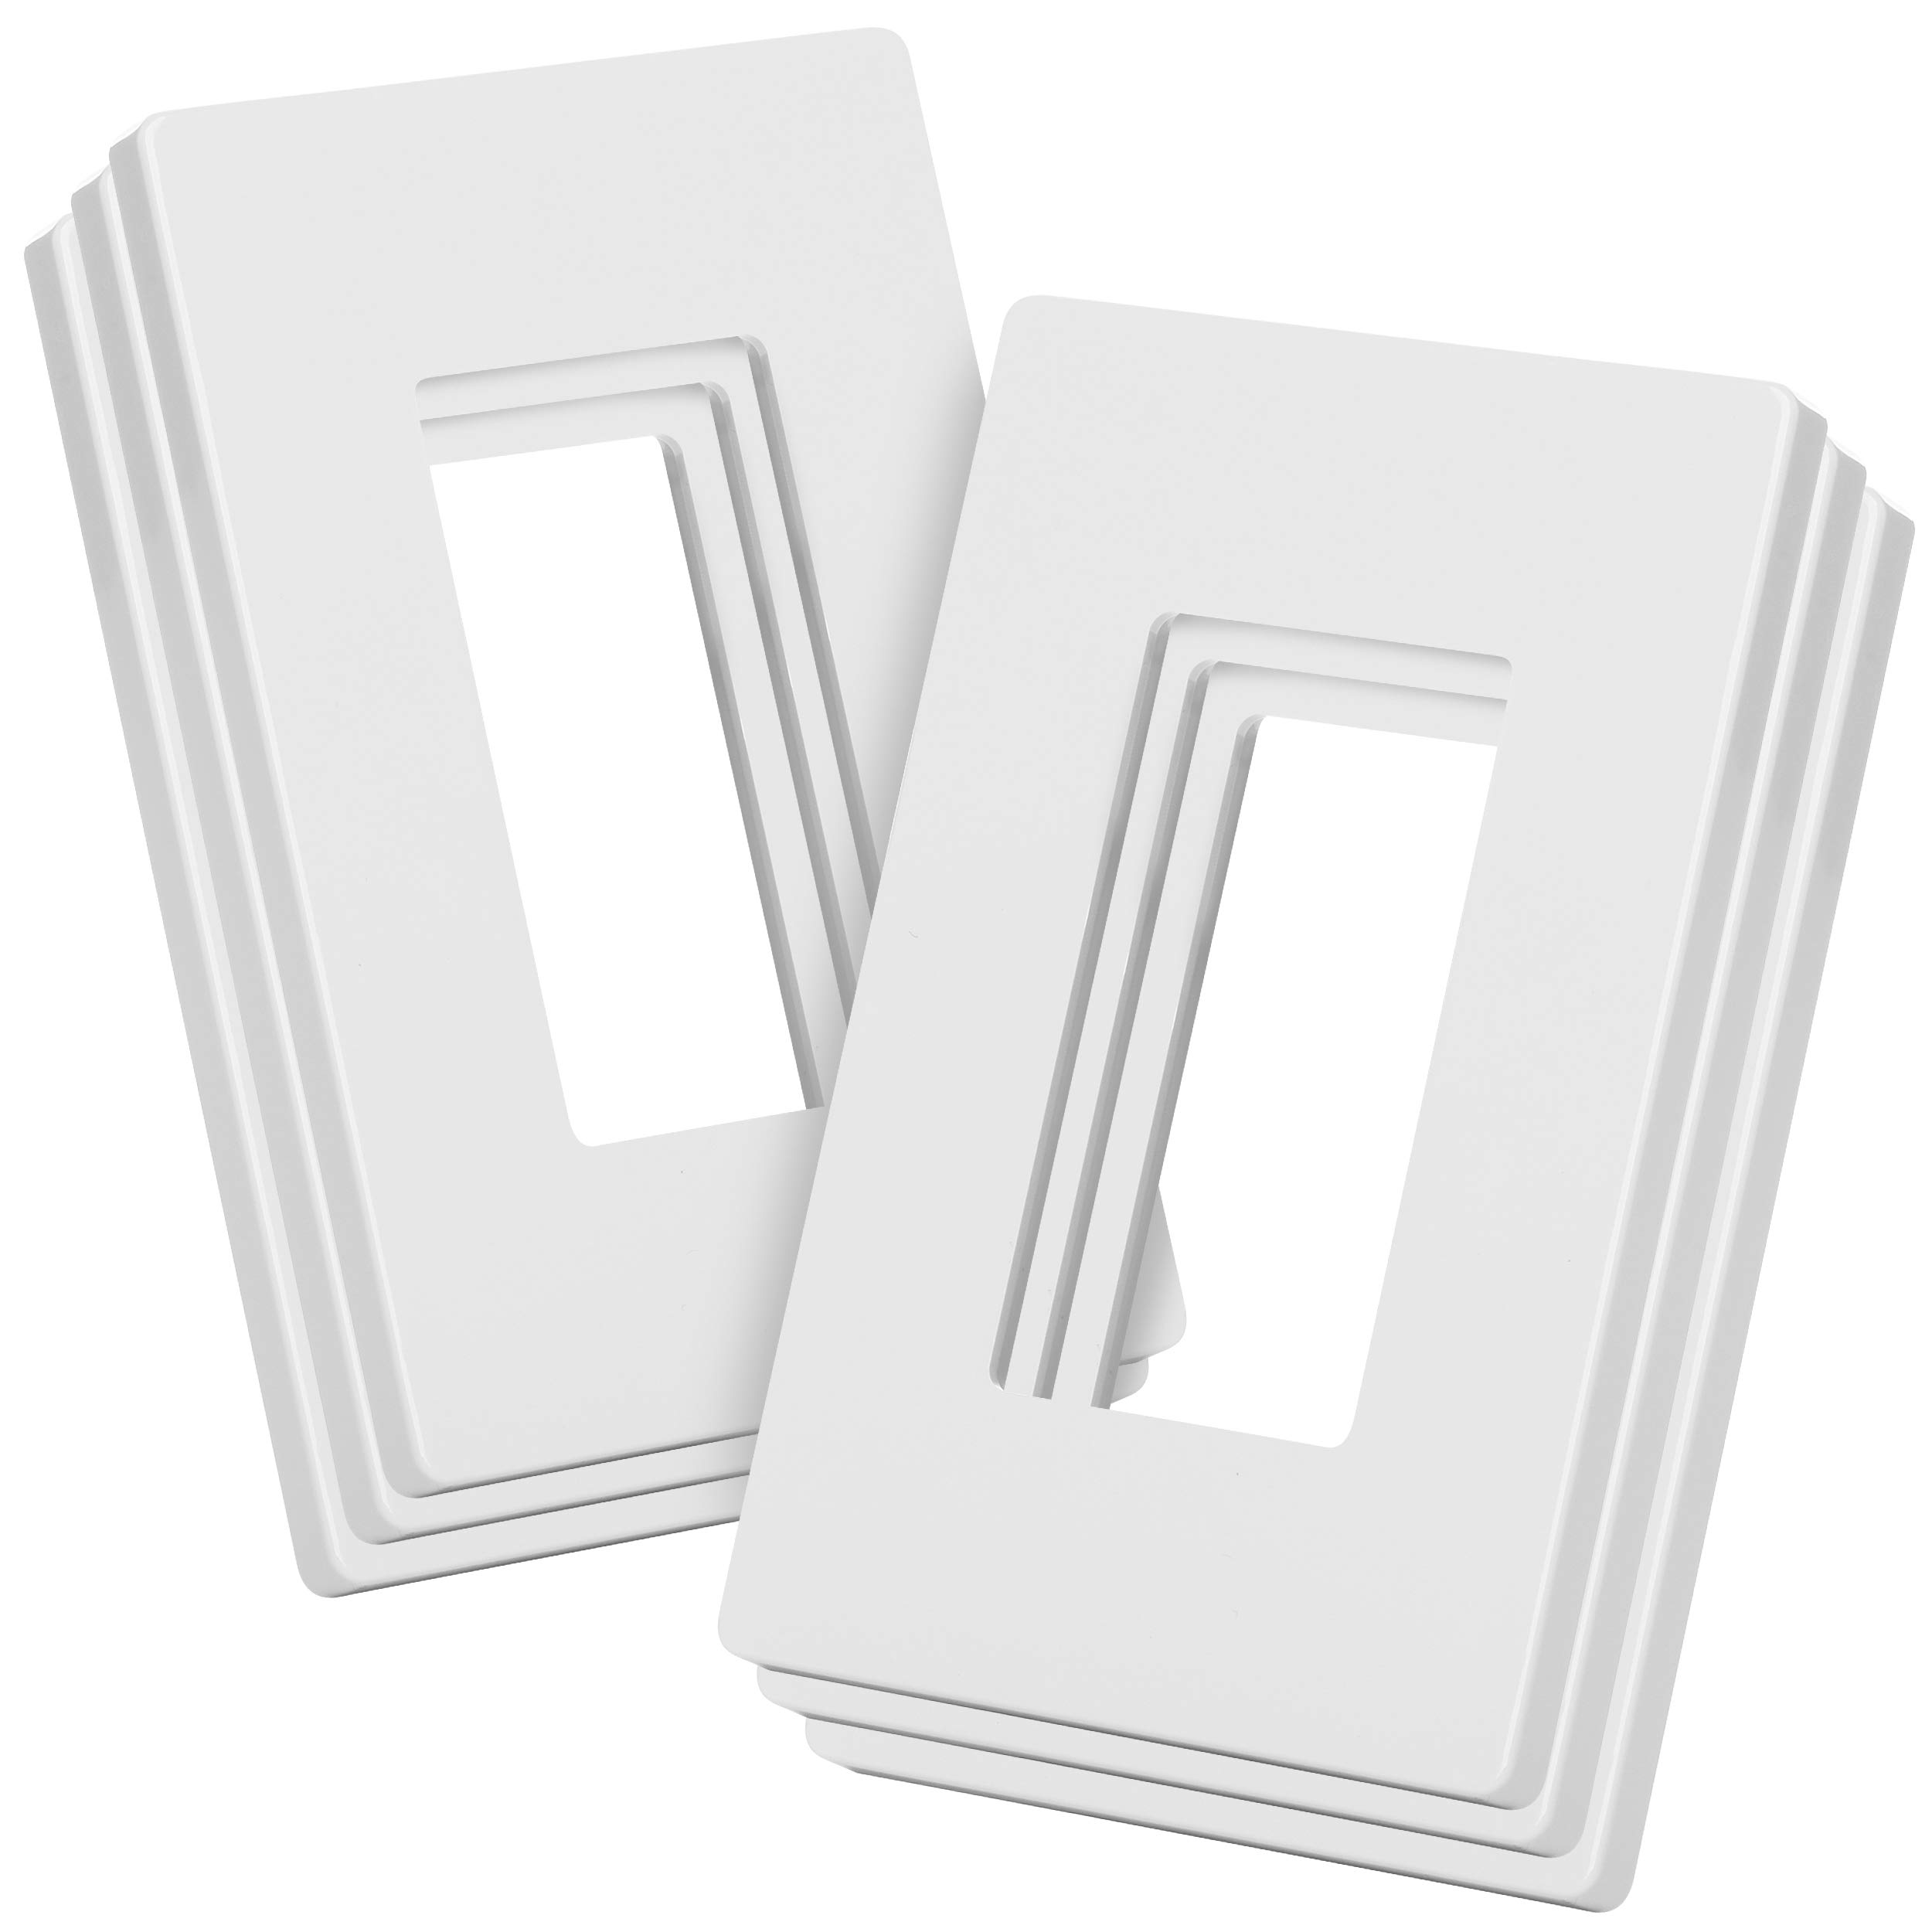 Bates- Screwless Decorator Wall Plates, Switch Plate Covers, 6 Pack, Screwless Wall Plates 1 Gang, White Switch Plate Covers, Switch Cover Plate, Wall Switch Cover, Electrical Outlet Cover Plate